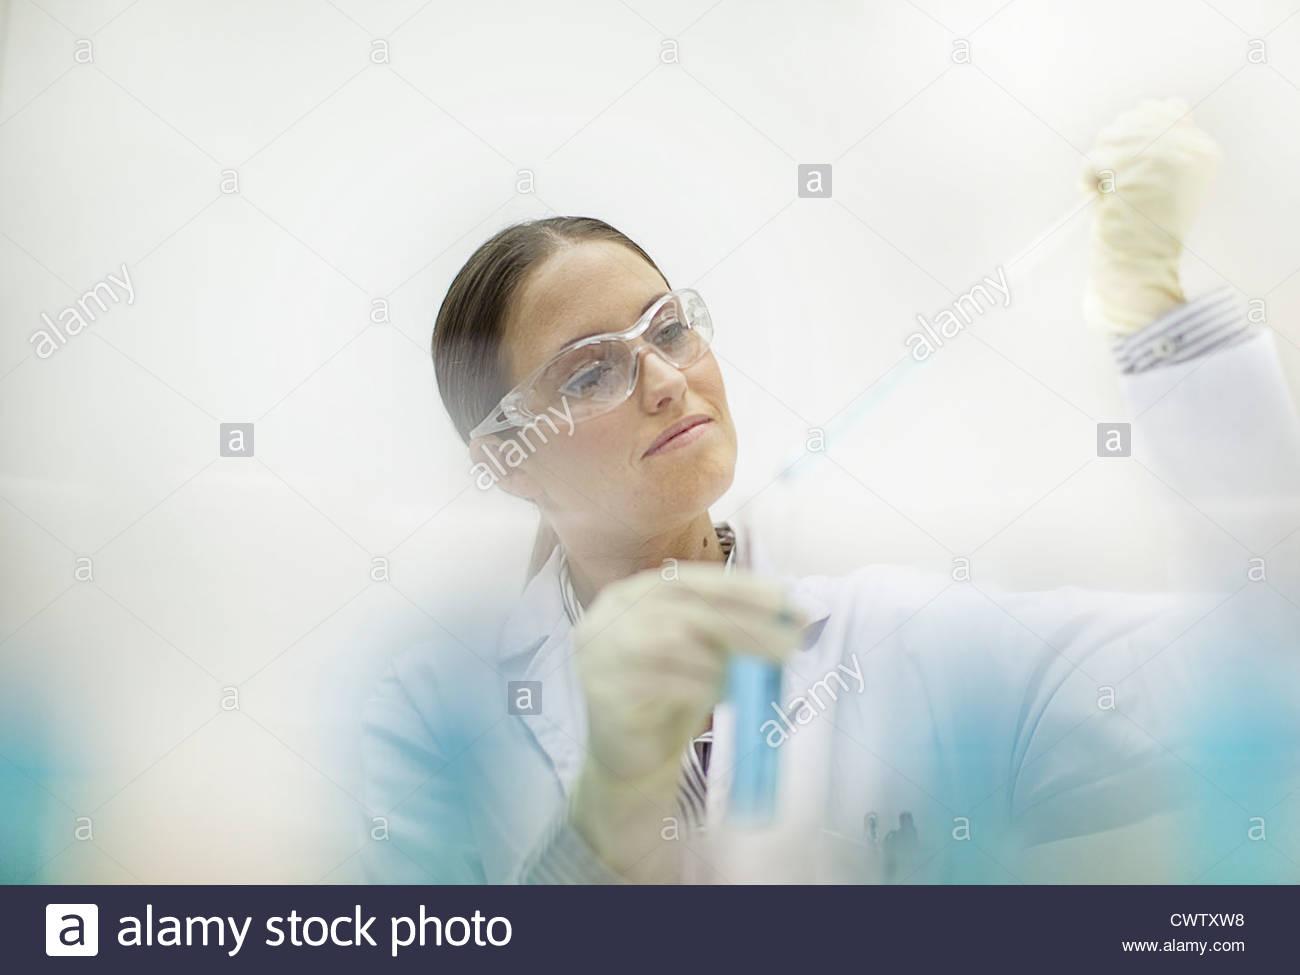 Scientist working in lab Photo Stock